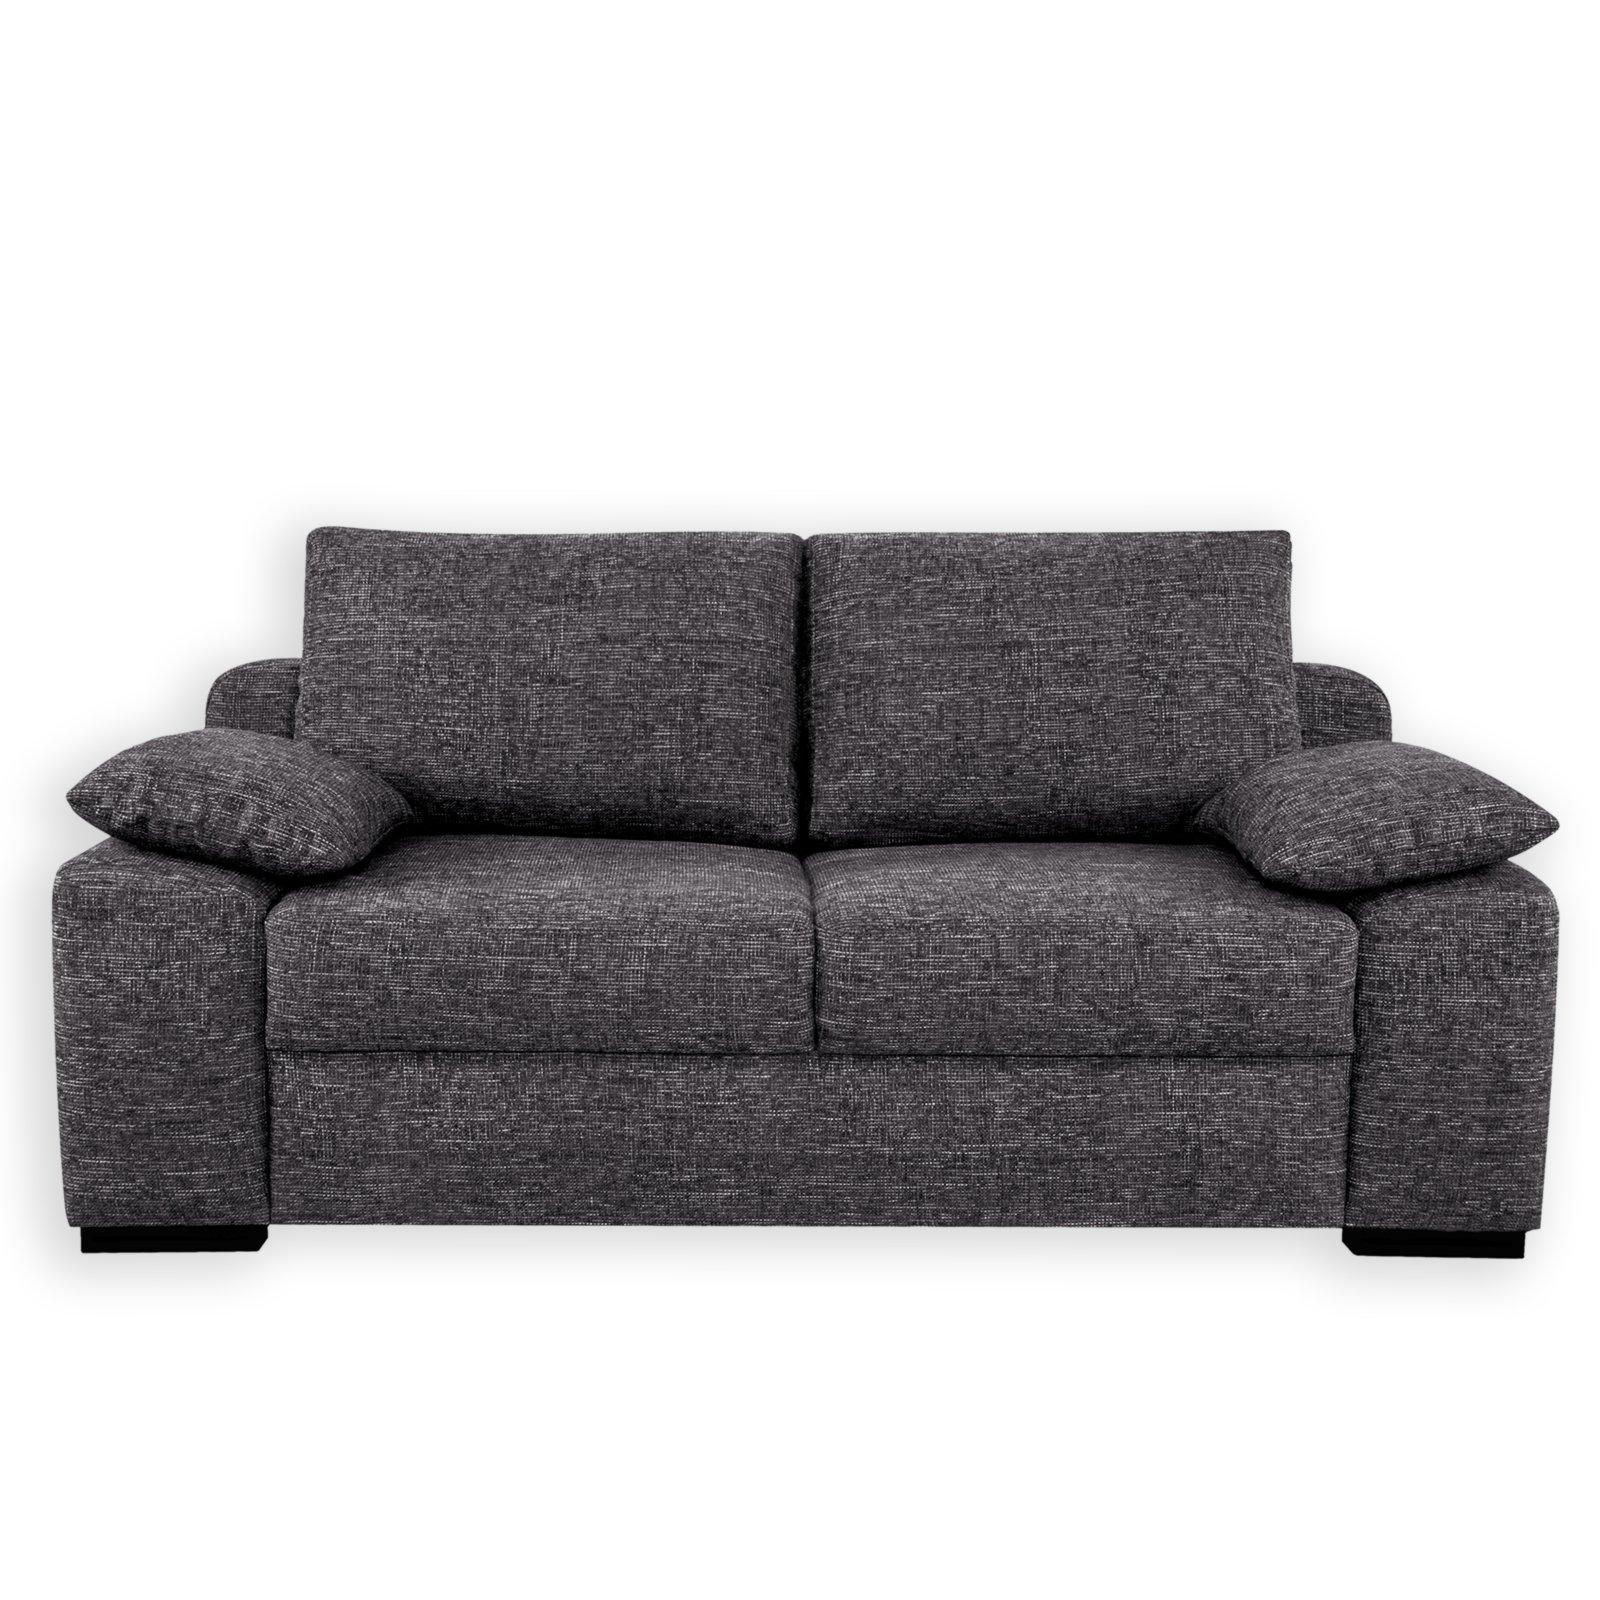 schlafsofa stein dauerschl fer inklusive kissen. Black Bedroom Furniture Sets. Home Design Ideas